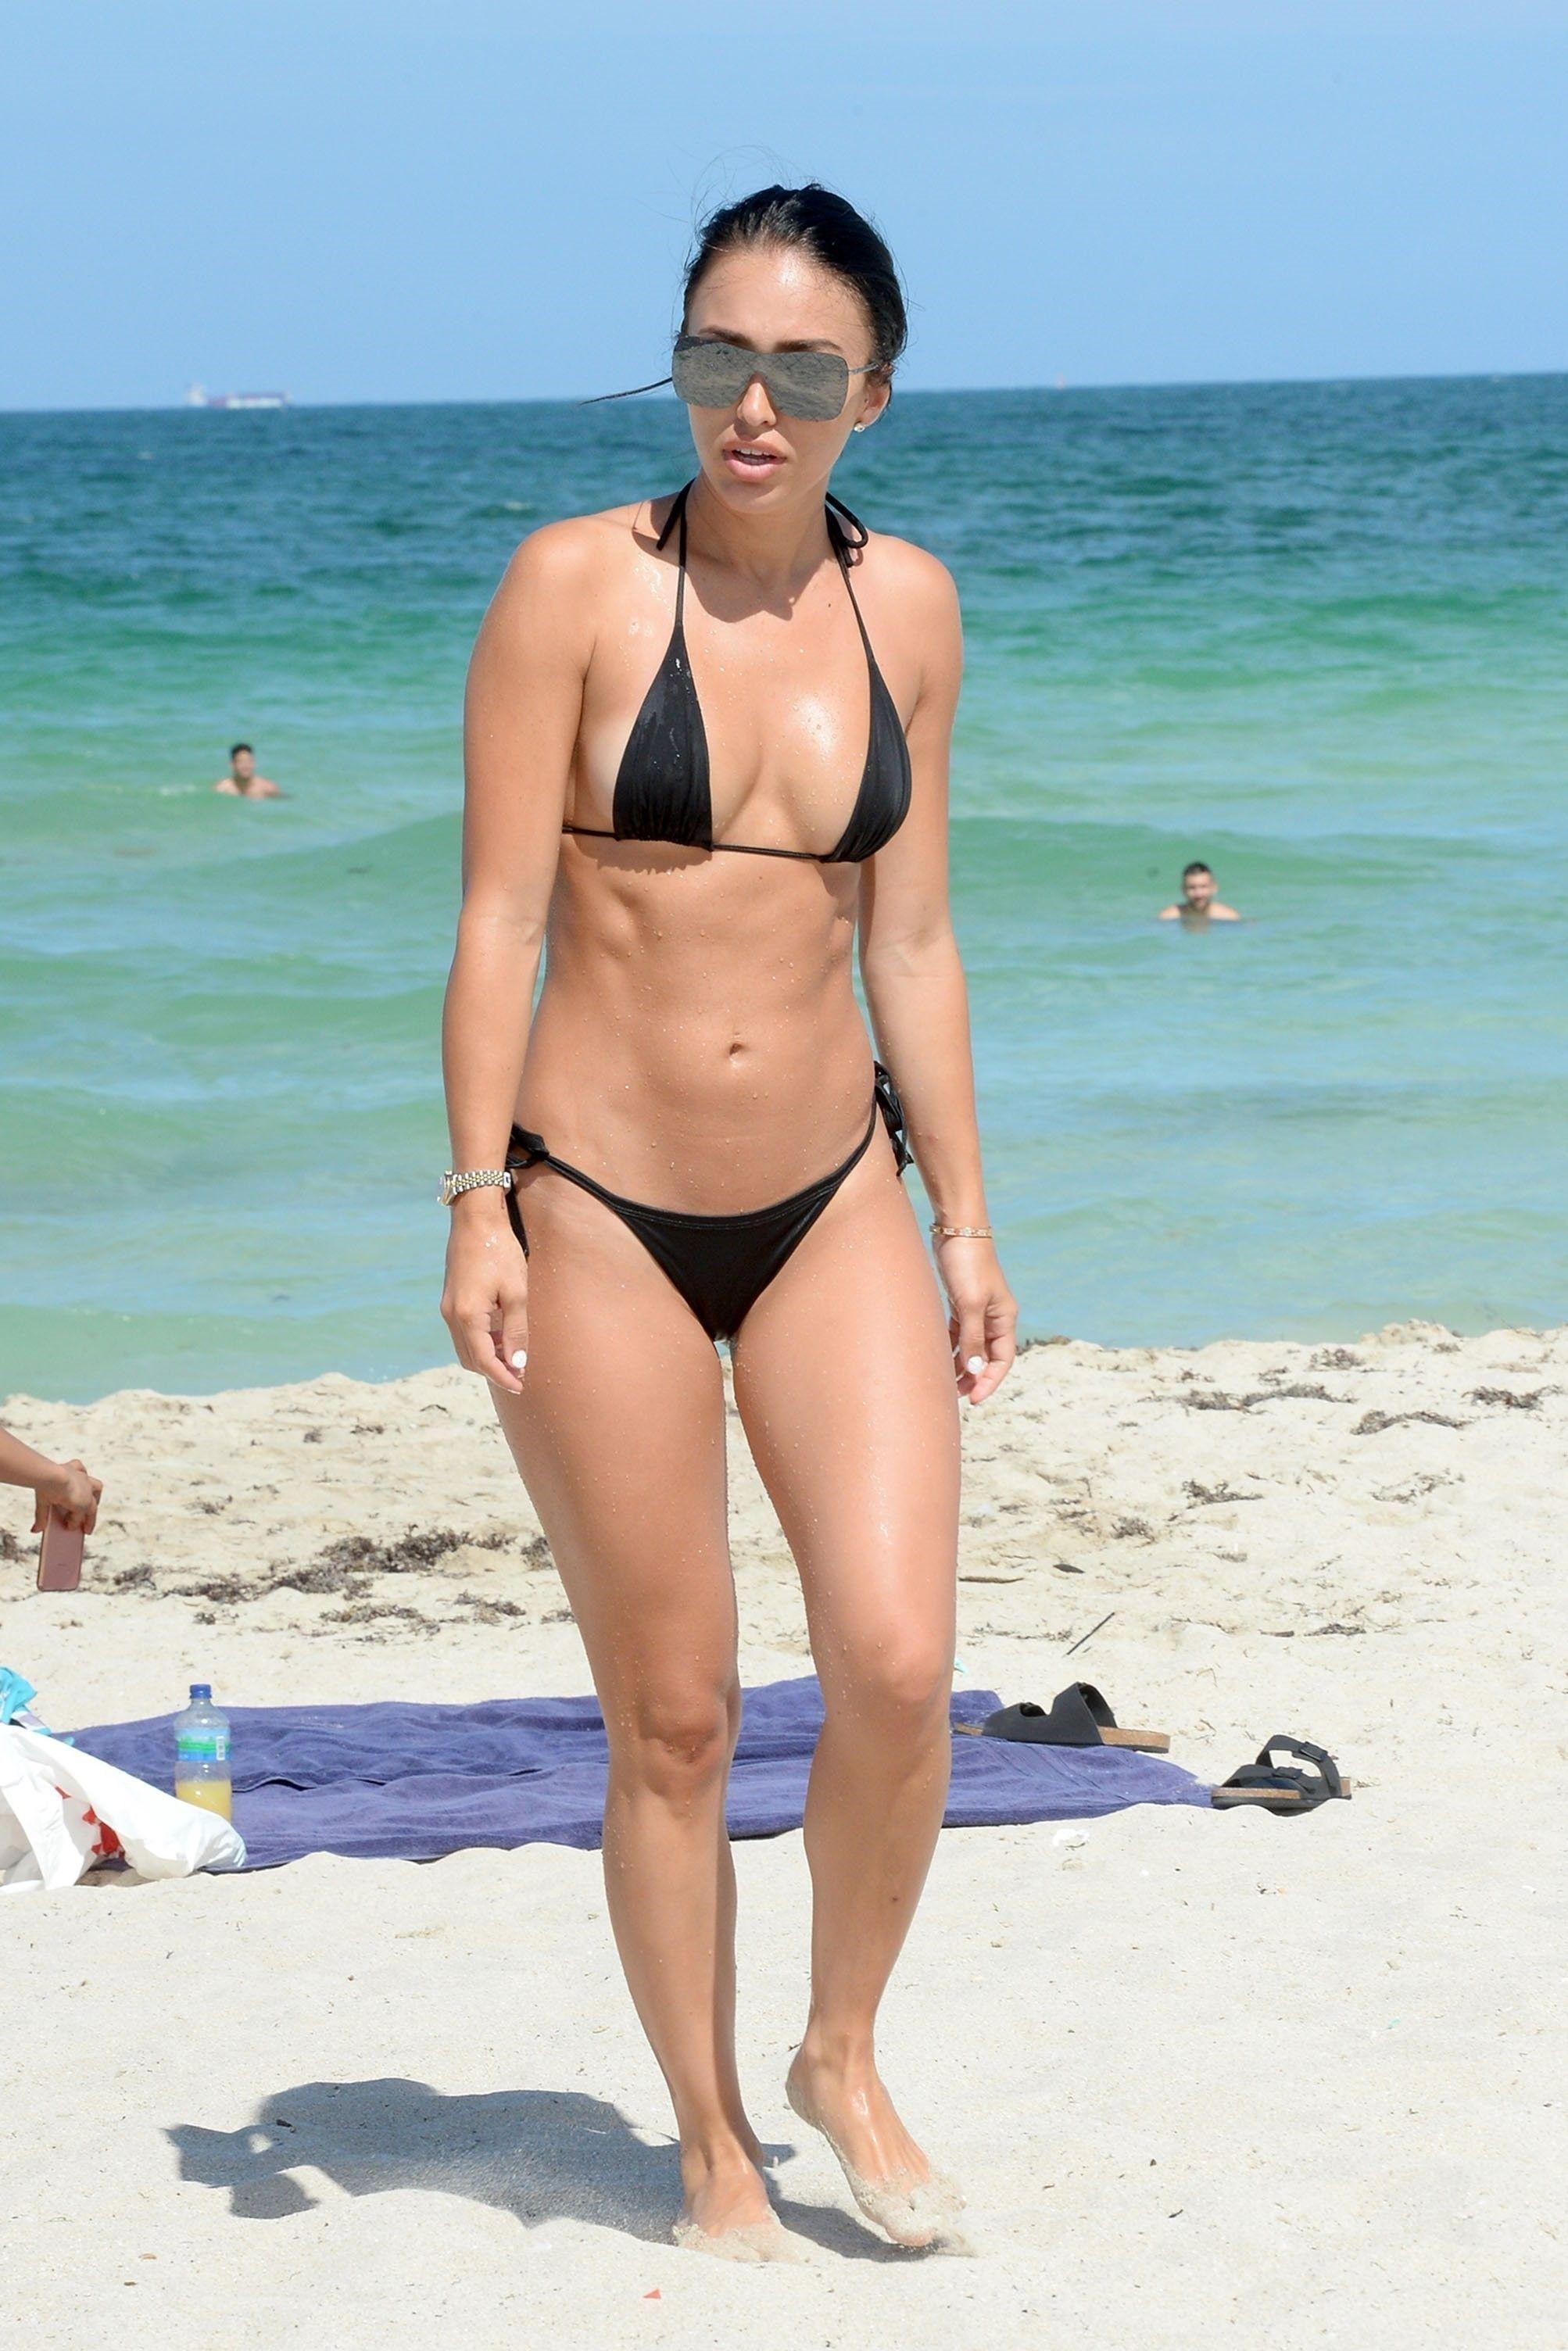 Celebrites Bre Tiesi nude (73 photo), Pussy, Sideboobs, Boobs, in bikini 2006